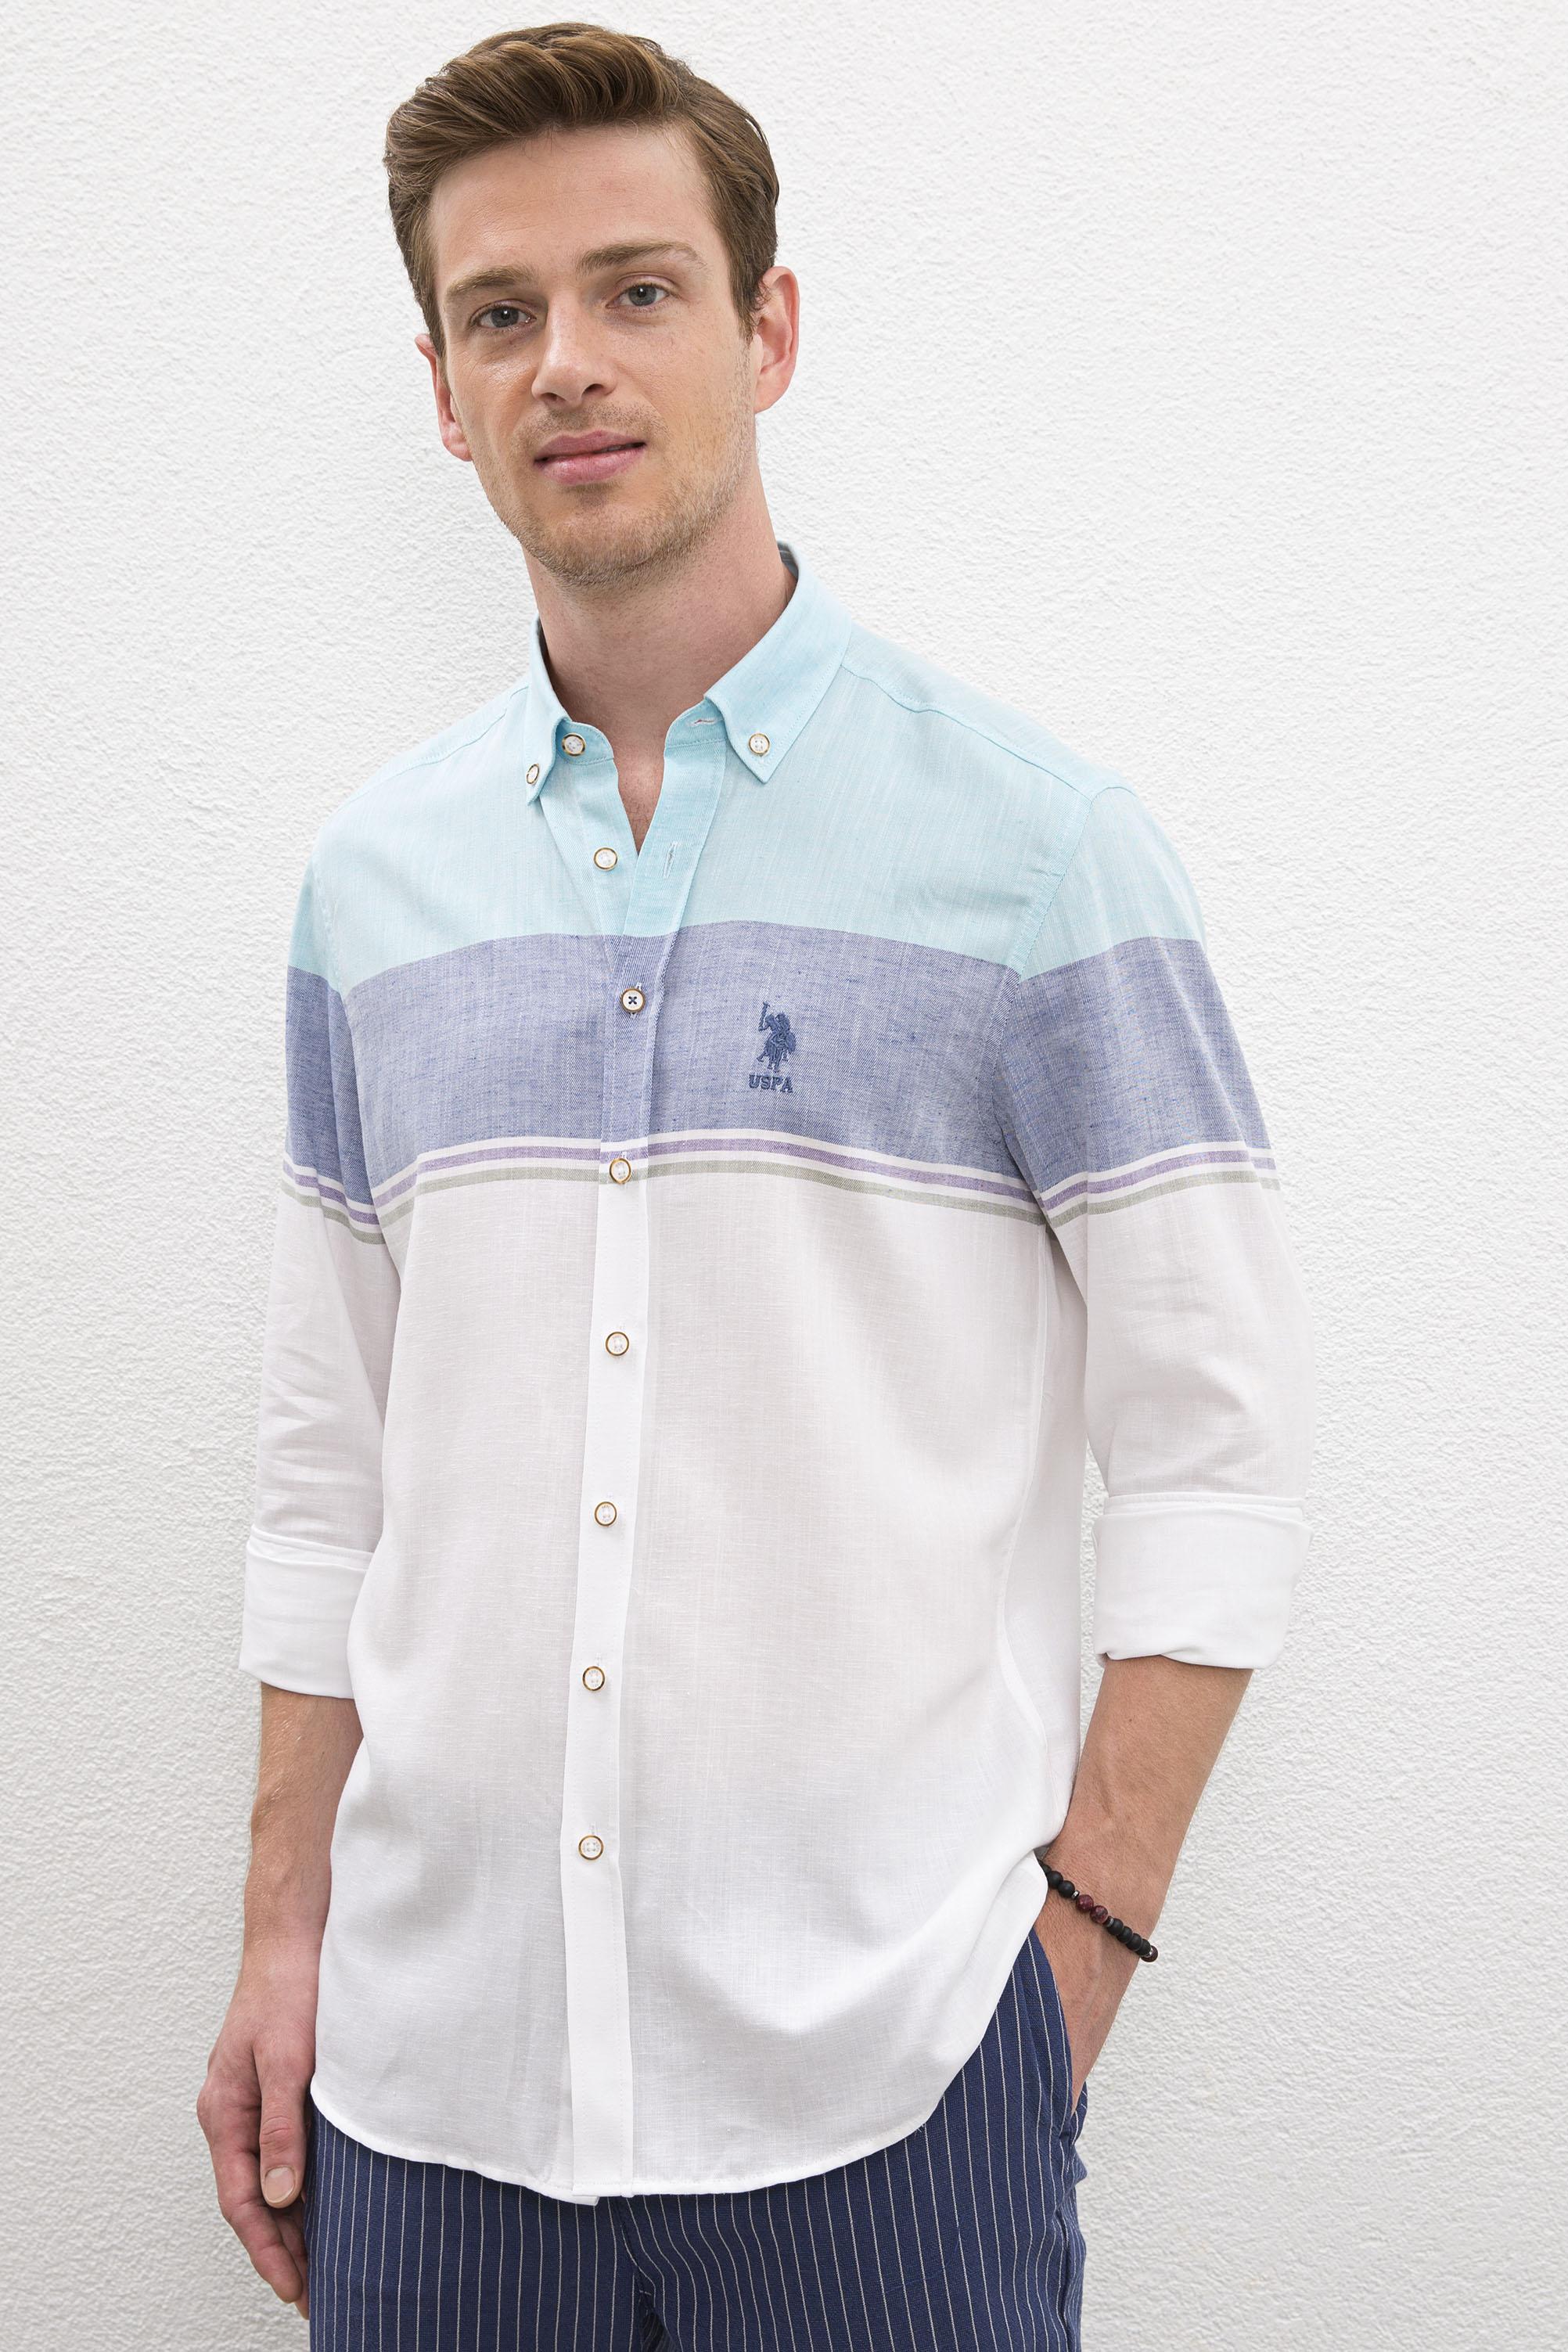 Рубашка мужская U.S. POLO Assn. G081SZ0040MAVIS белая L